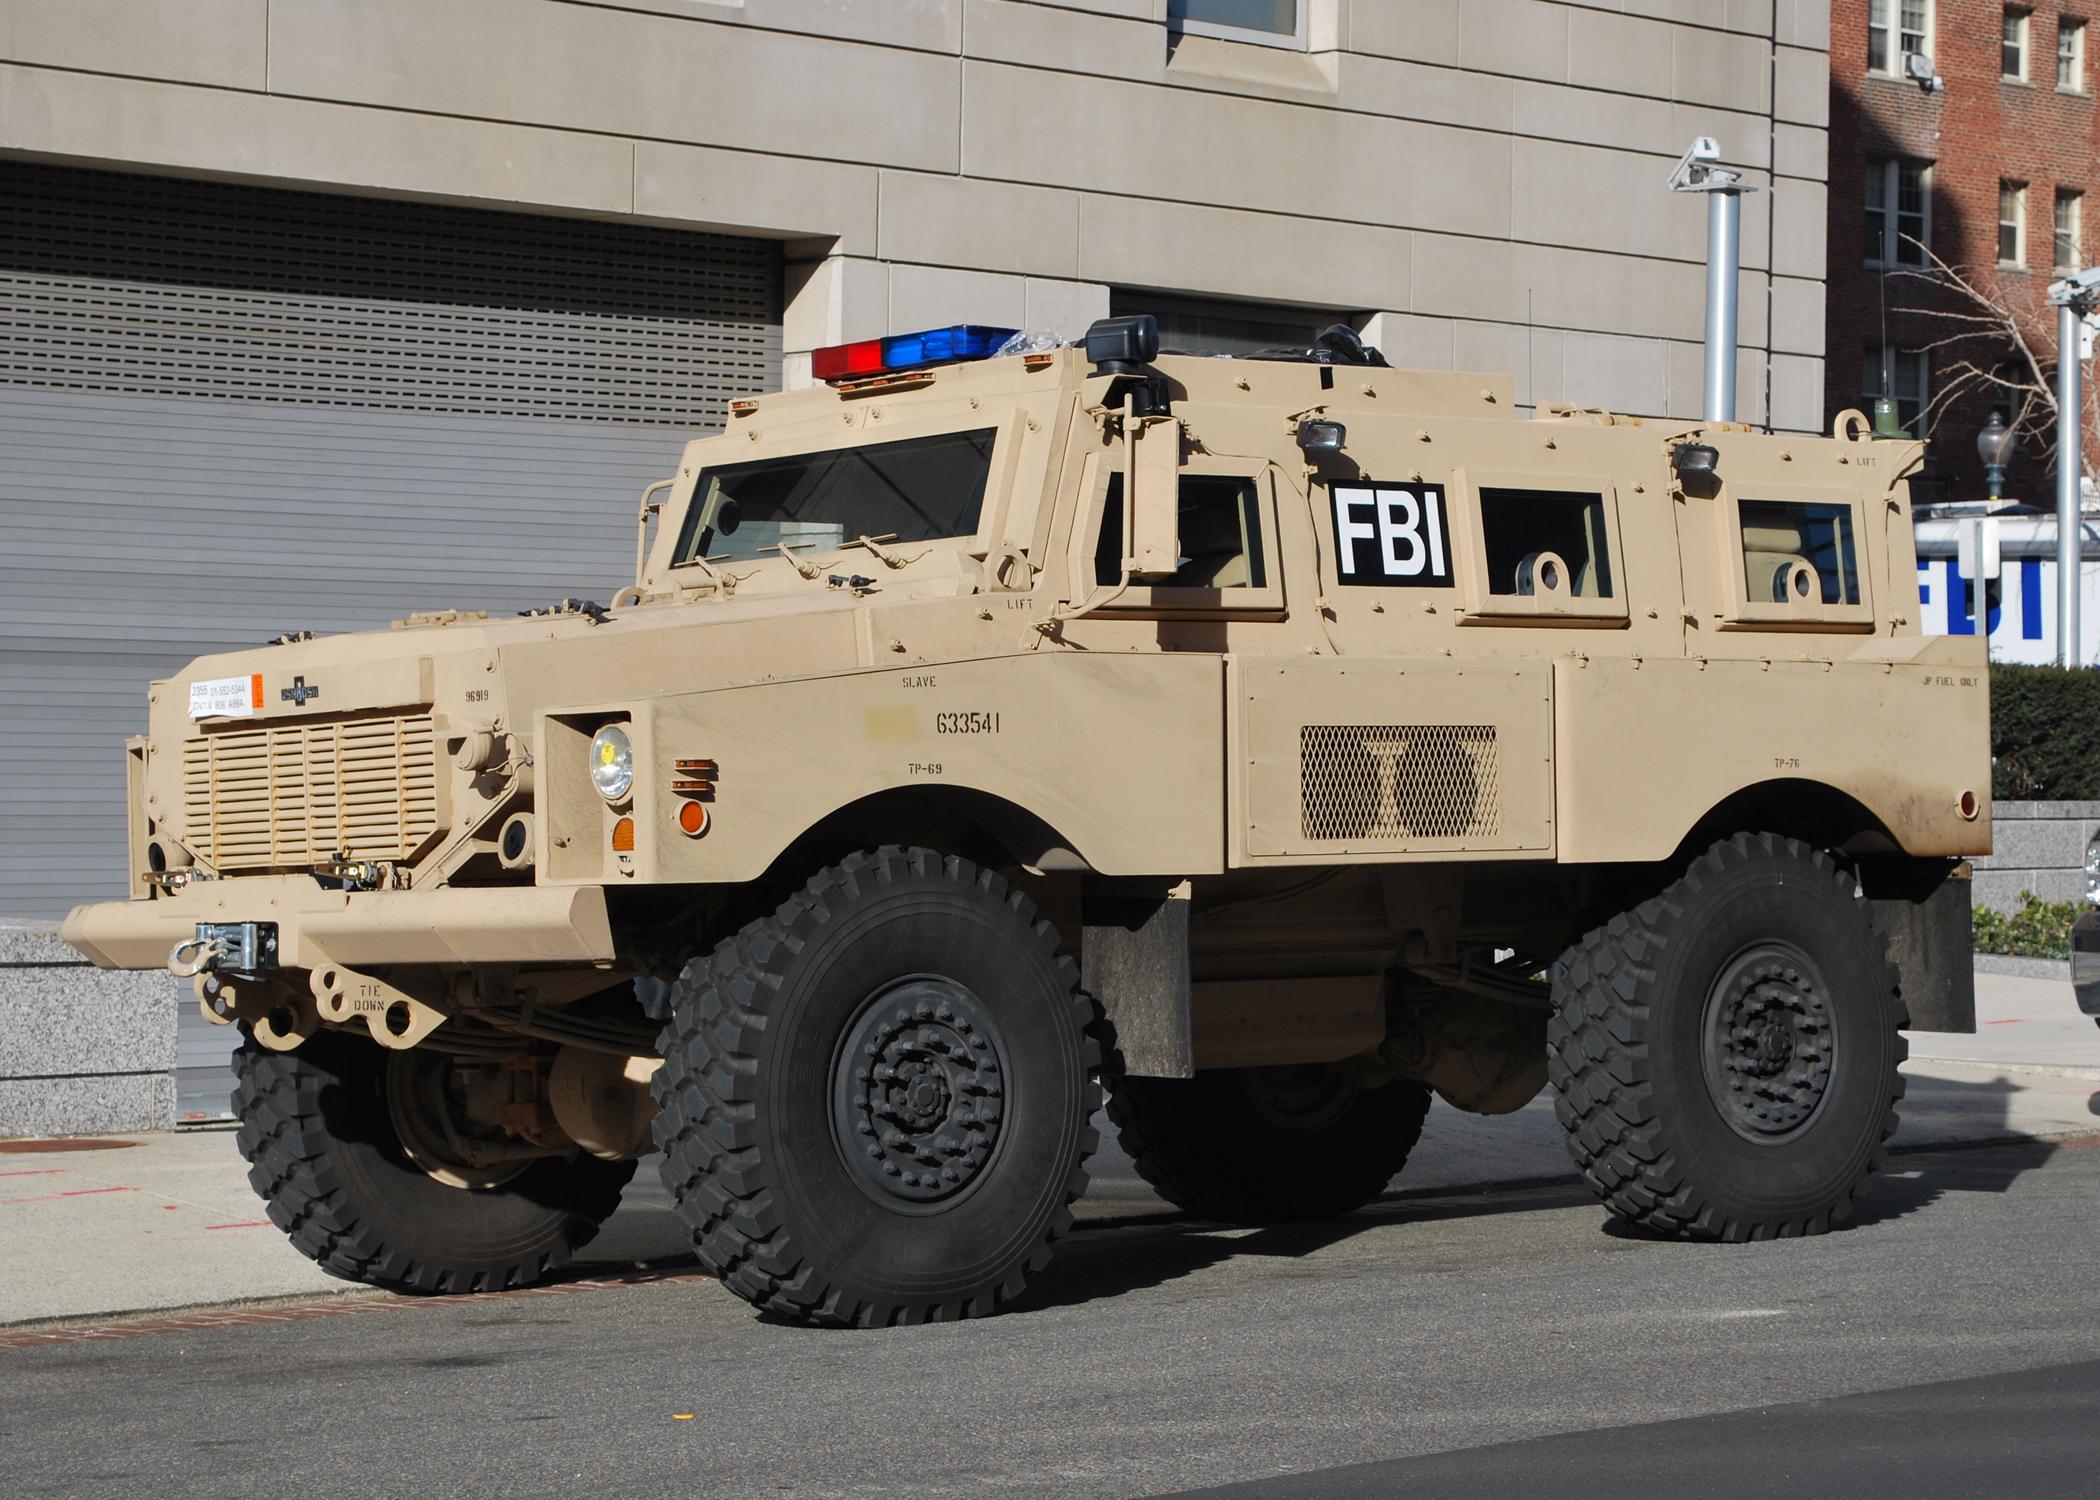 File:FBI Mine Resistant Ambush vehicle.jpg  Wikimedia Commons